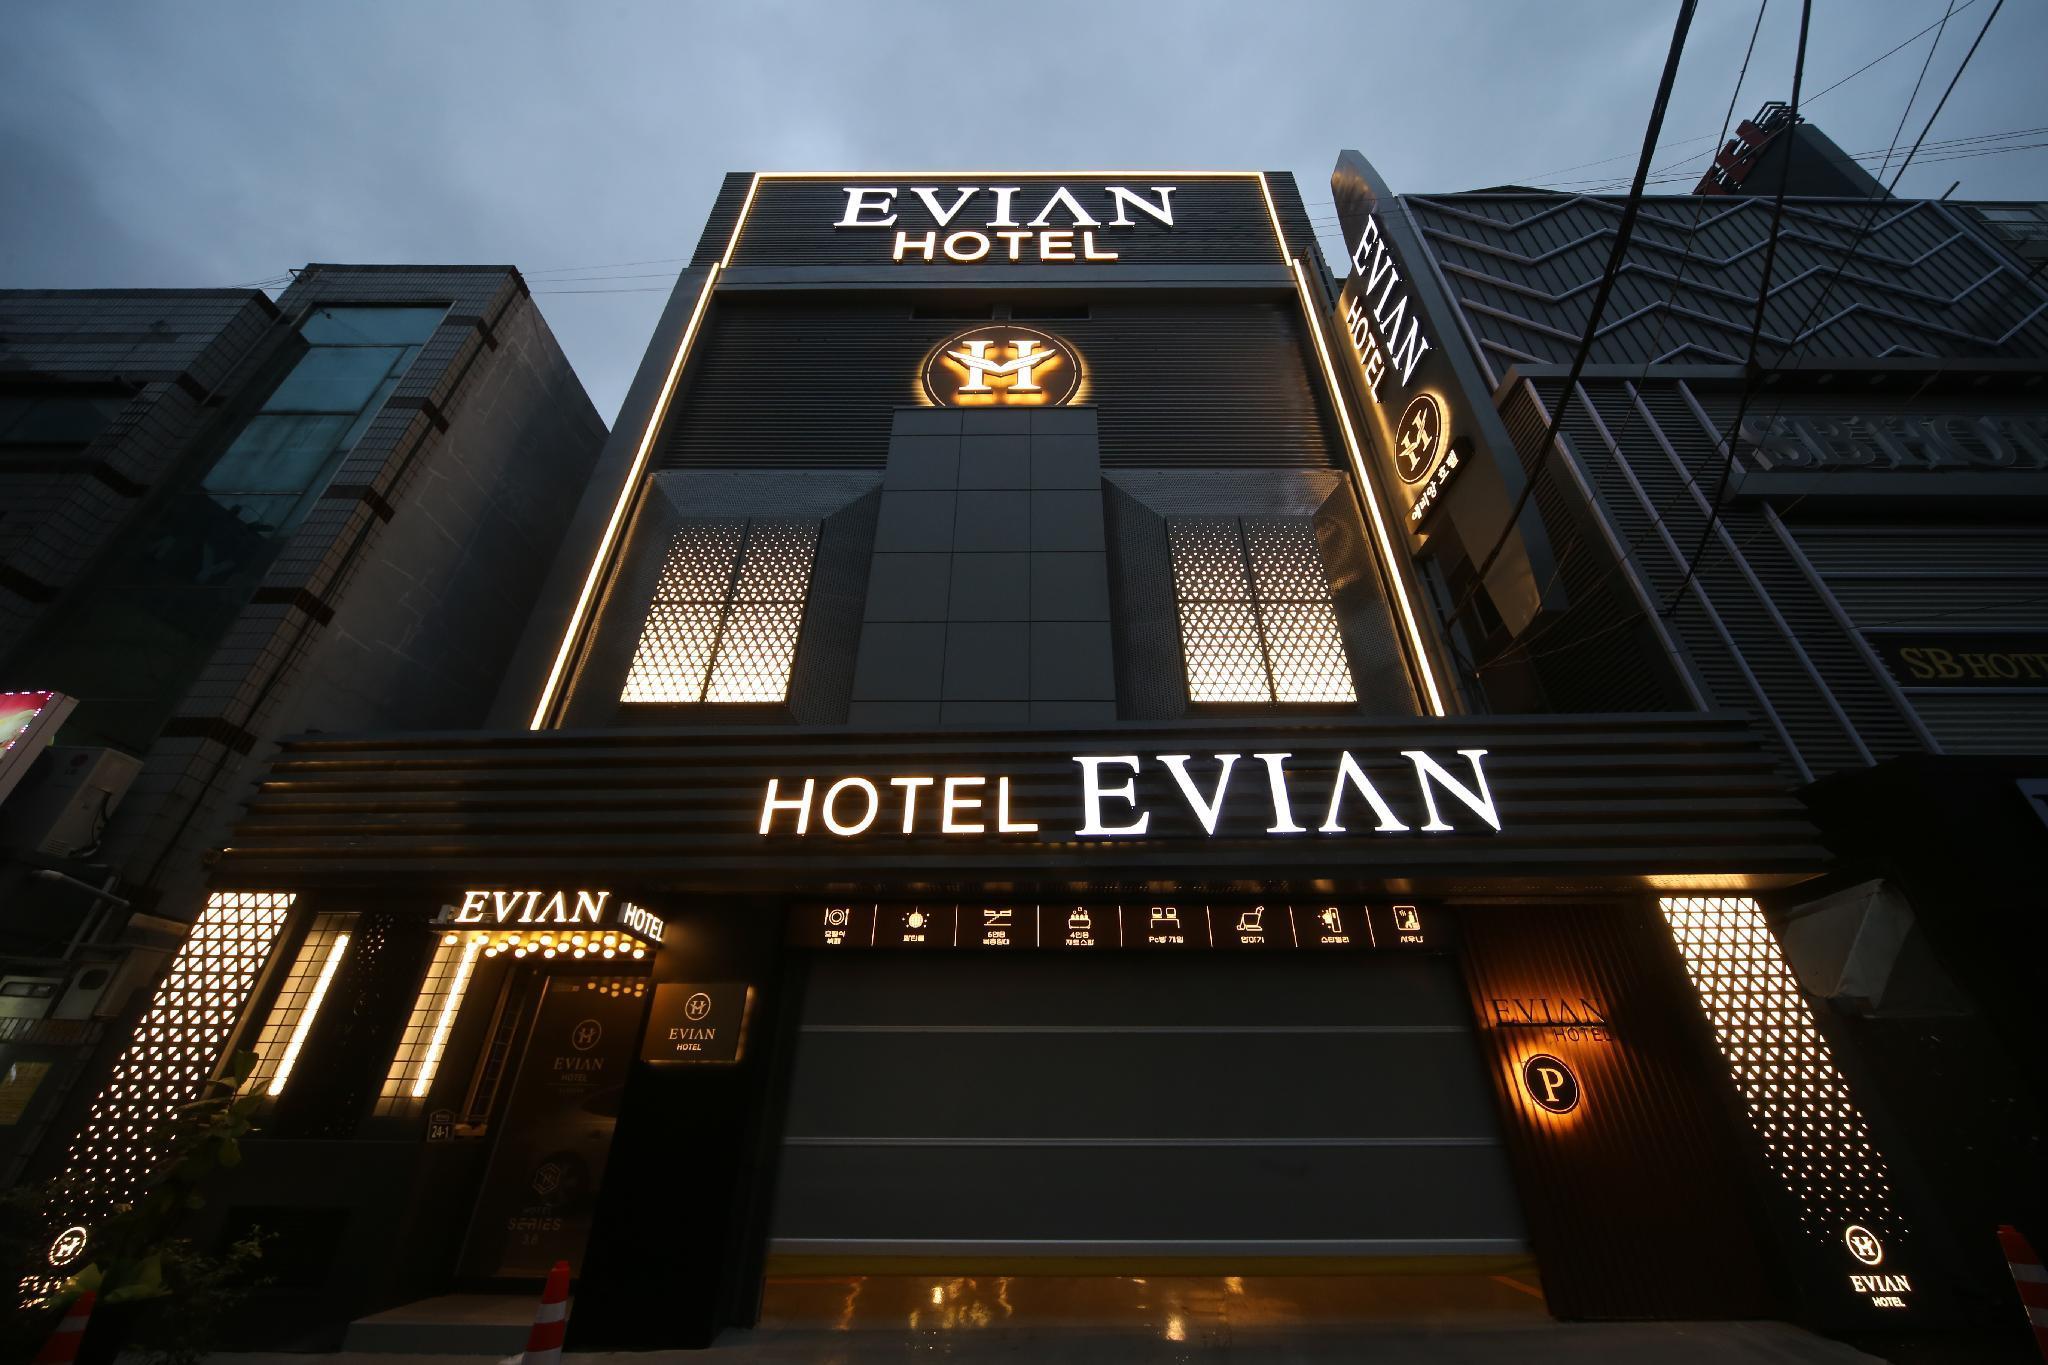 Hotel Evian